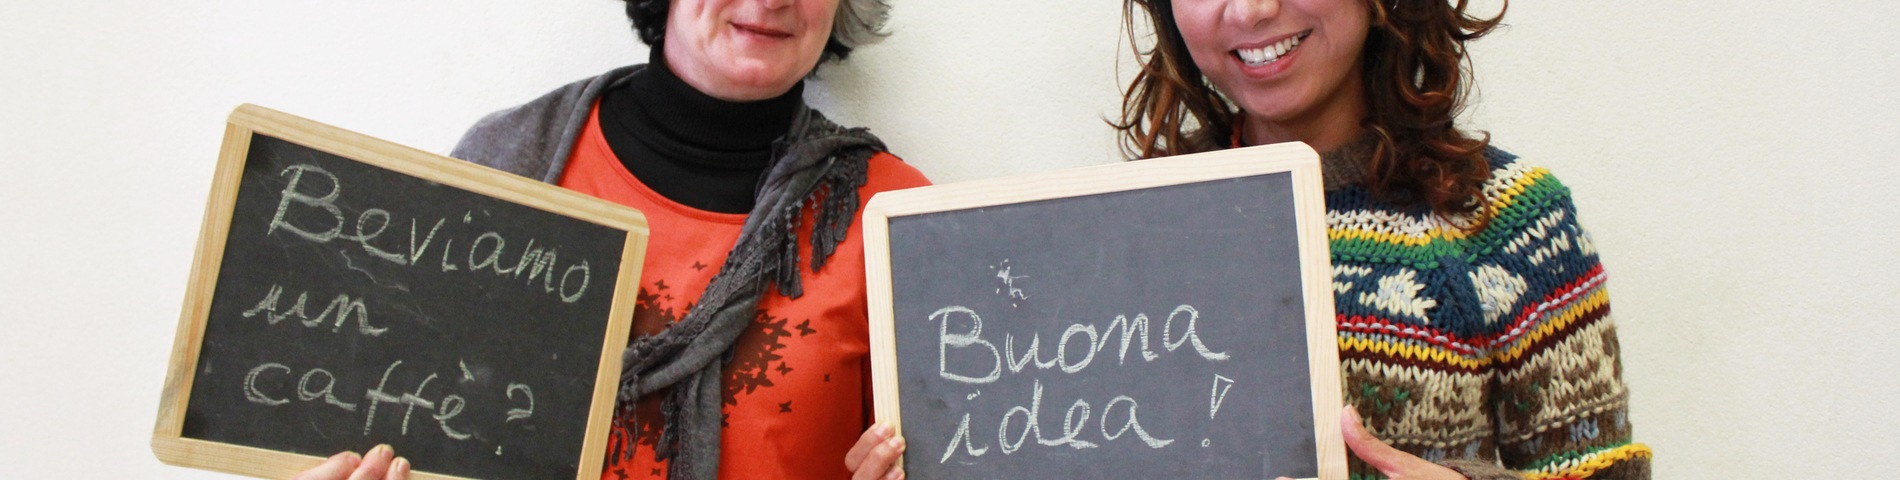 Trieste Language School bild 1